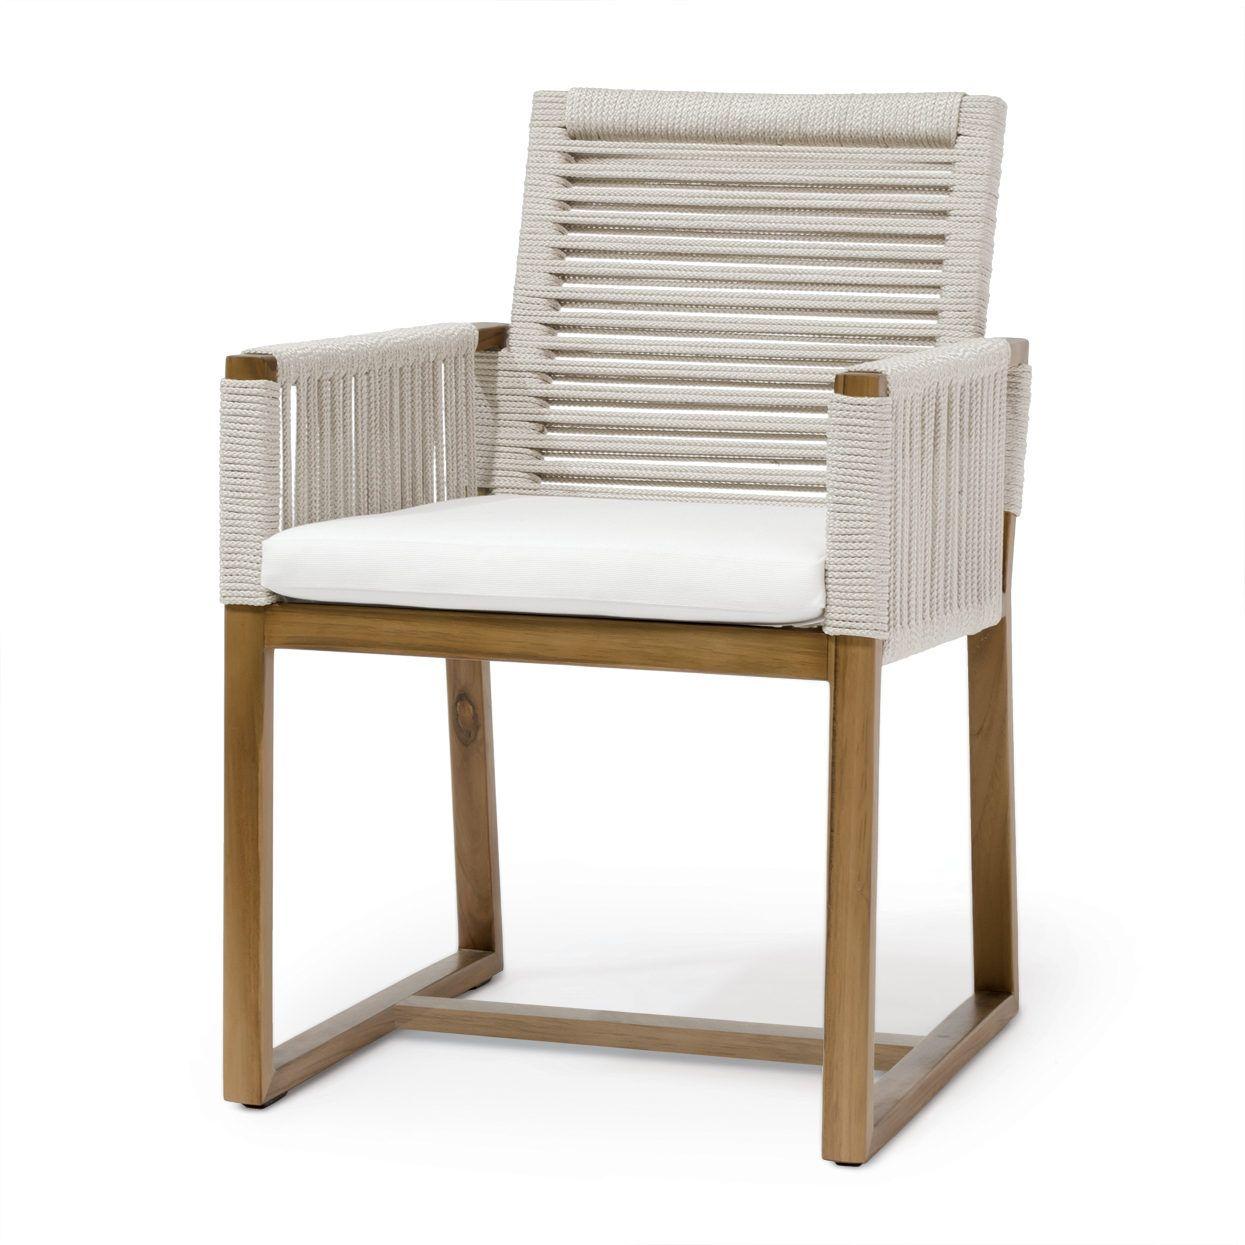 Wayfarer Outdoor Arm Chair - Mecox Gardens  Outdoor side chairs